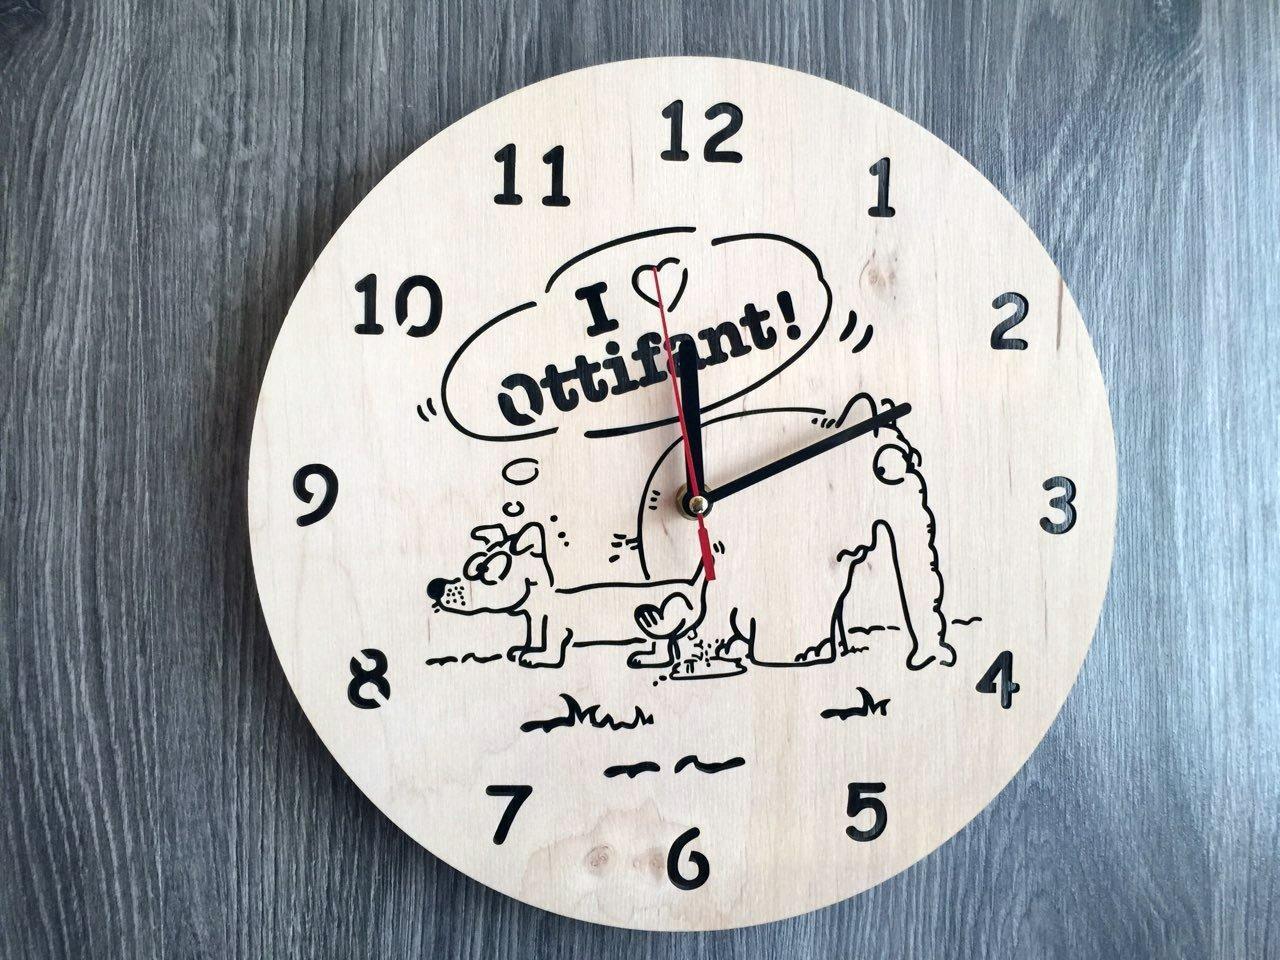 Хендмейд часы из дерева 7Arts Слоник Оттифантен CL-0160